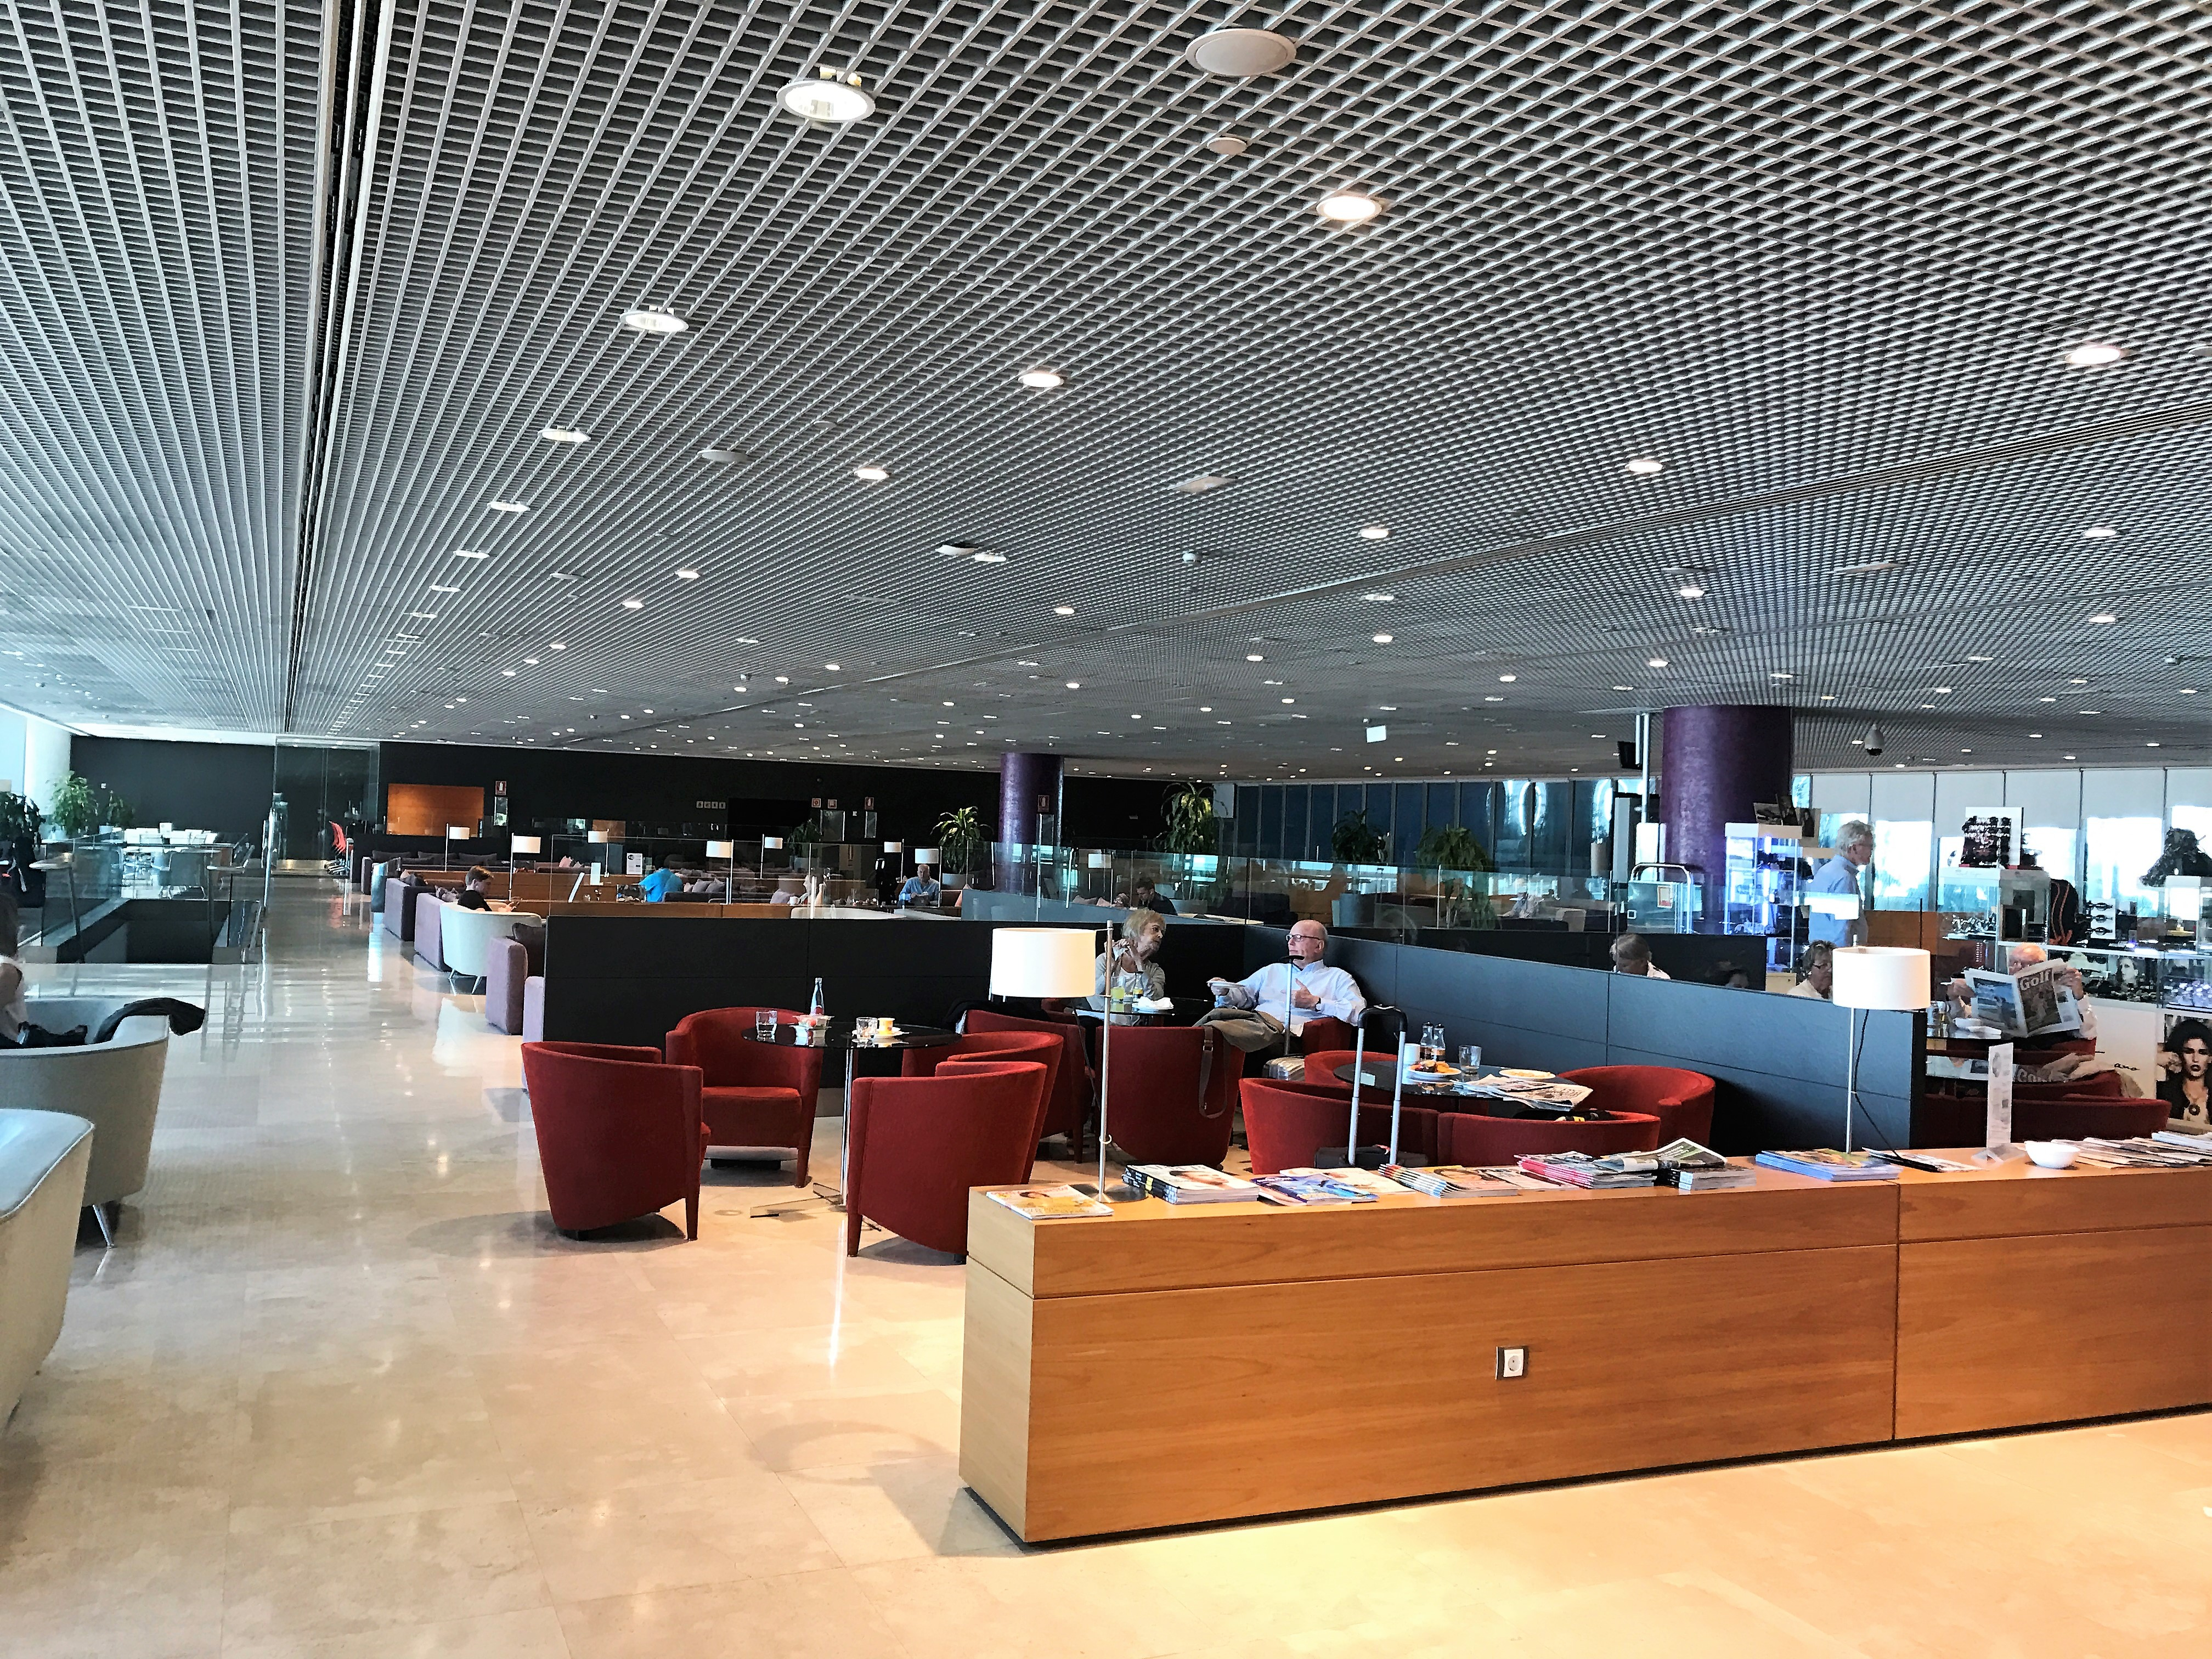 British Airways lounge Sala VIP at Malaga Airport